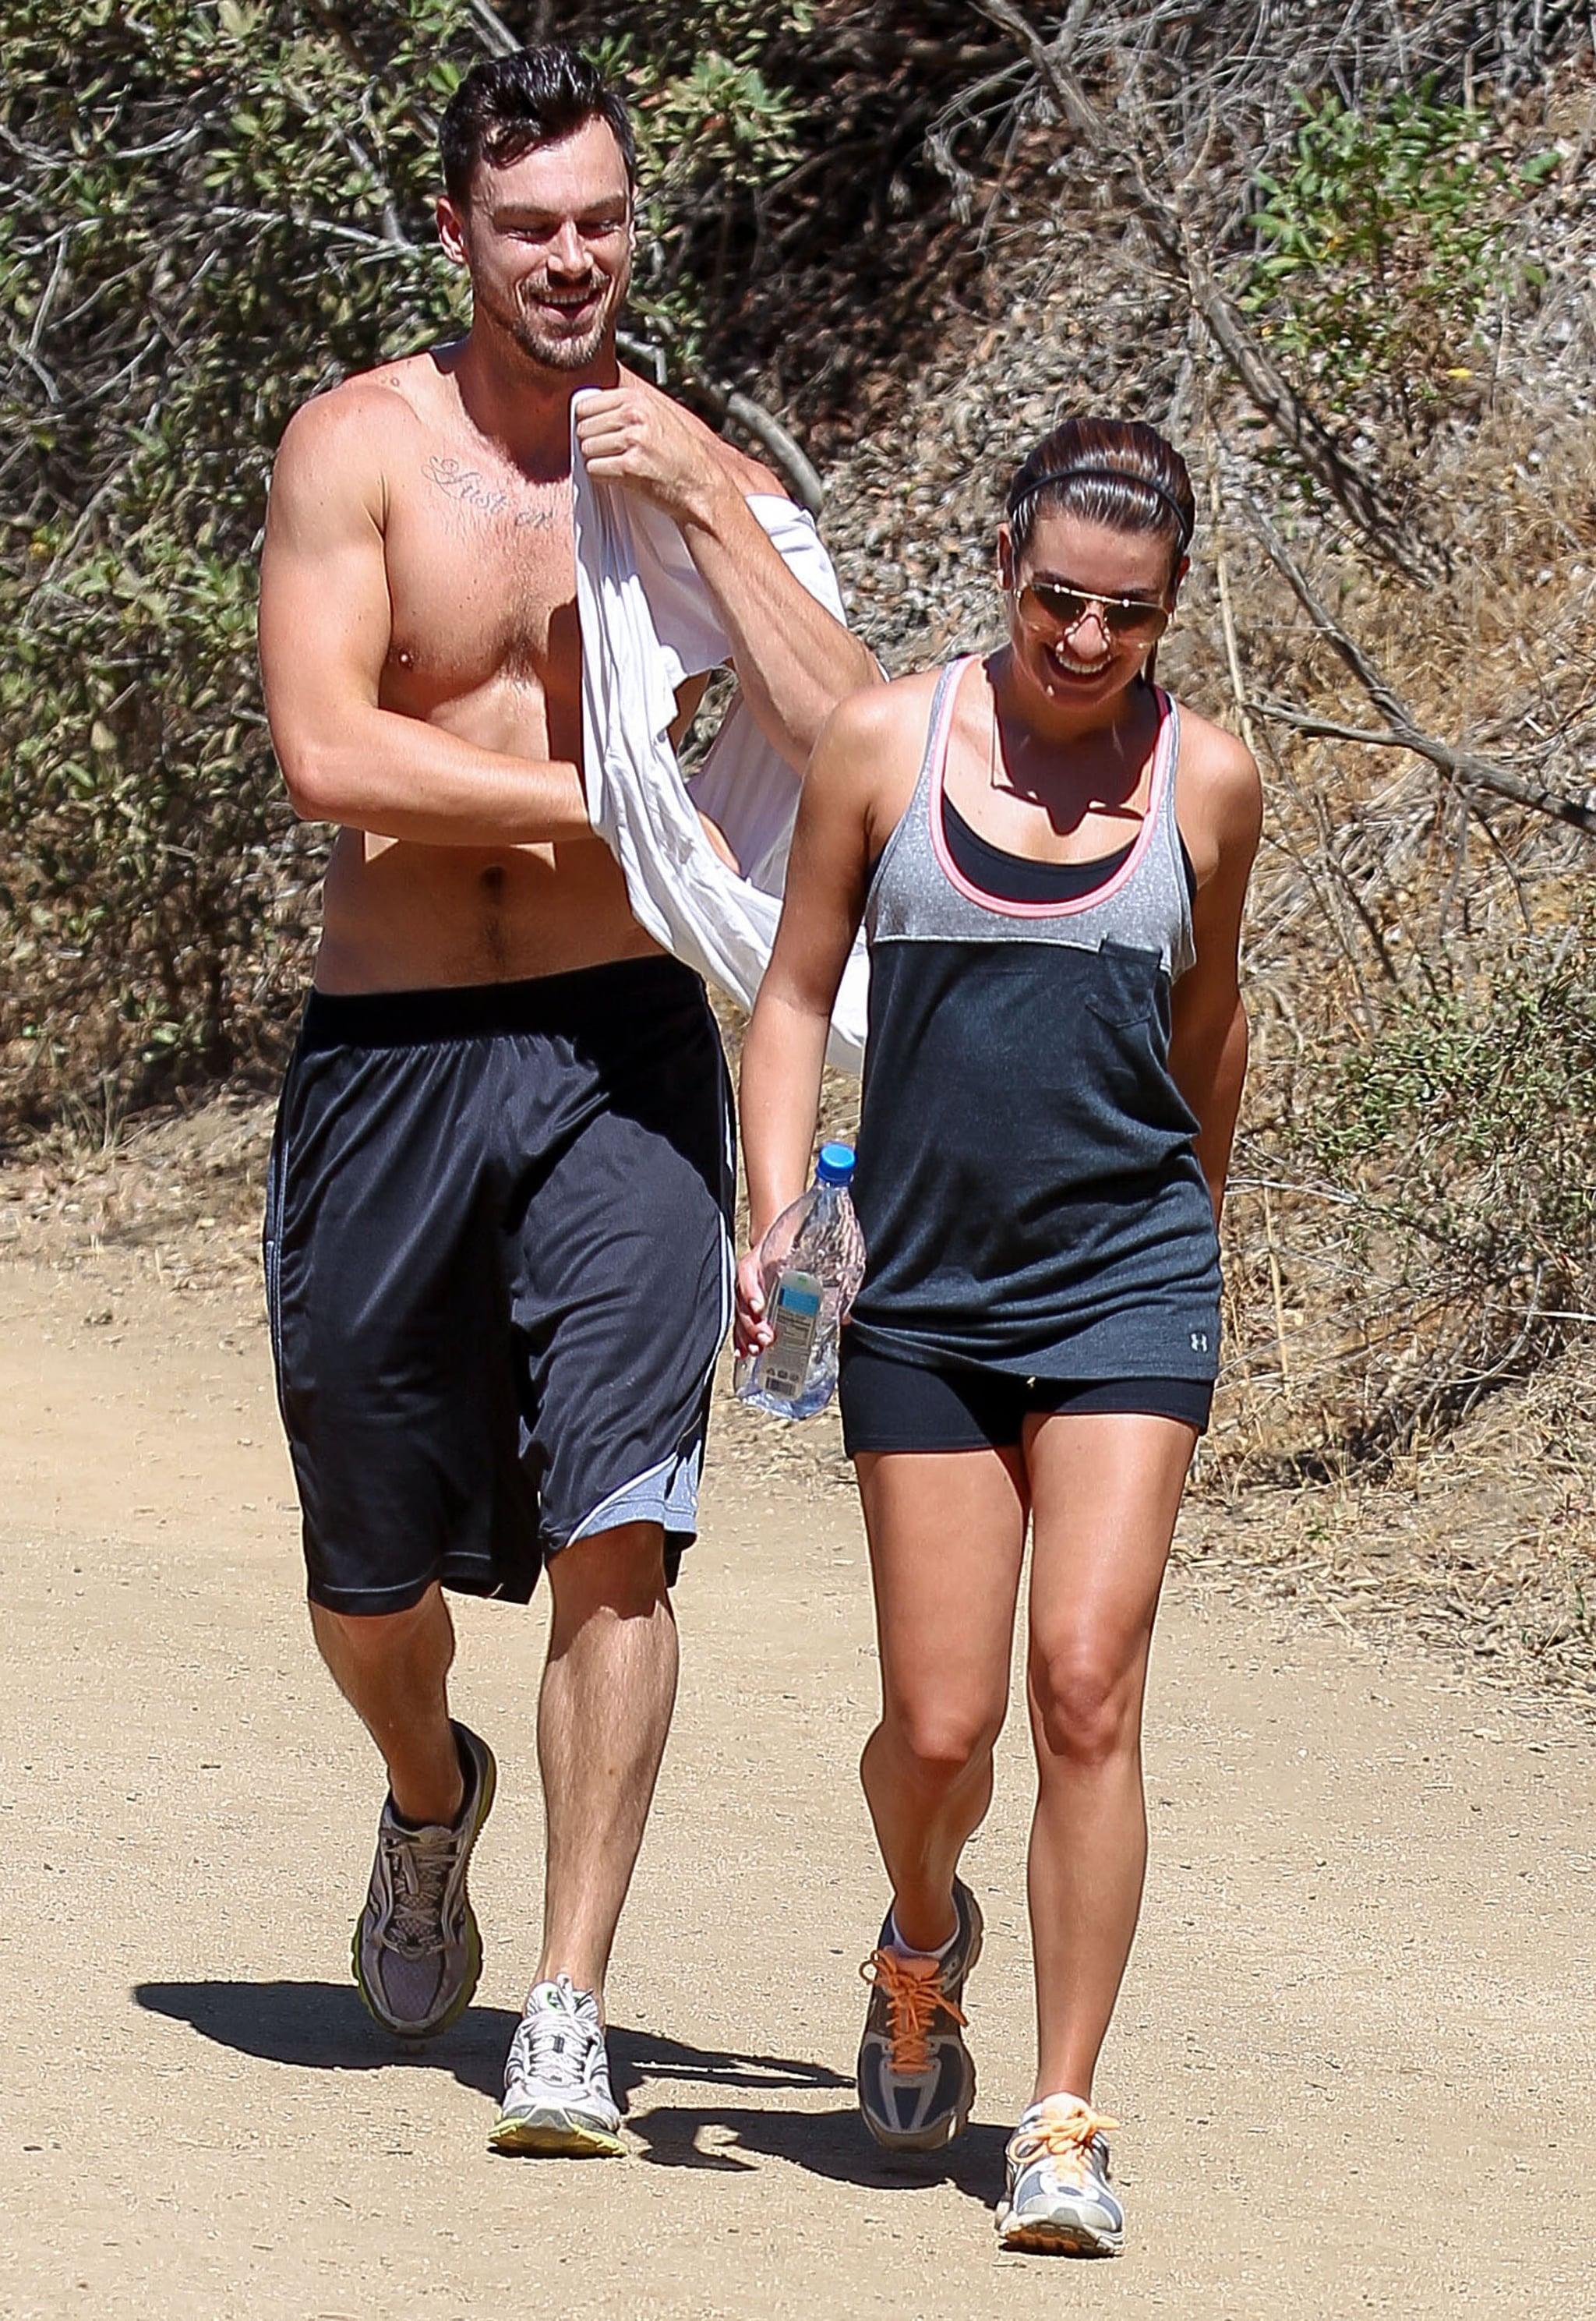 Lea Michele went hiking with shirtless boyfriend Matthew Paetz in LA on Saturday.